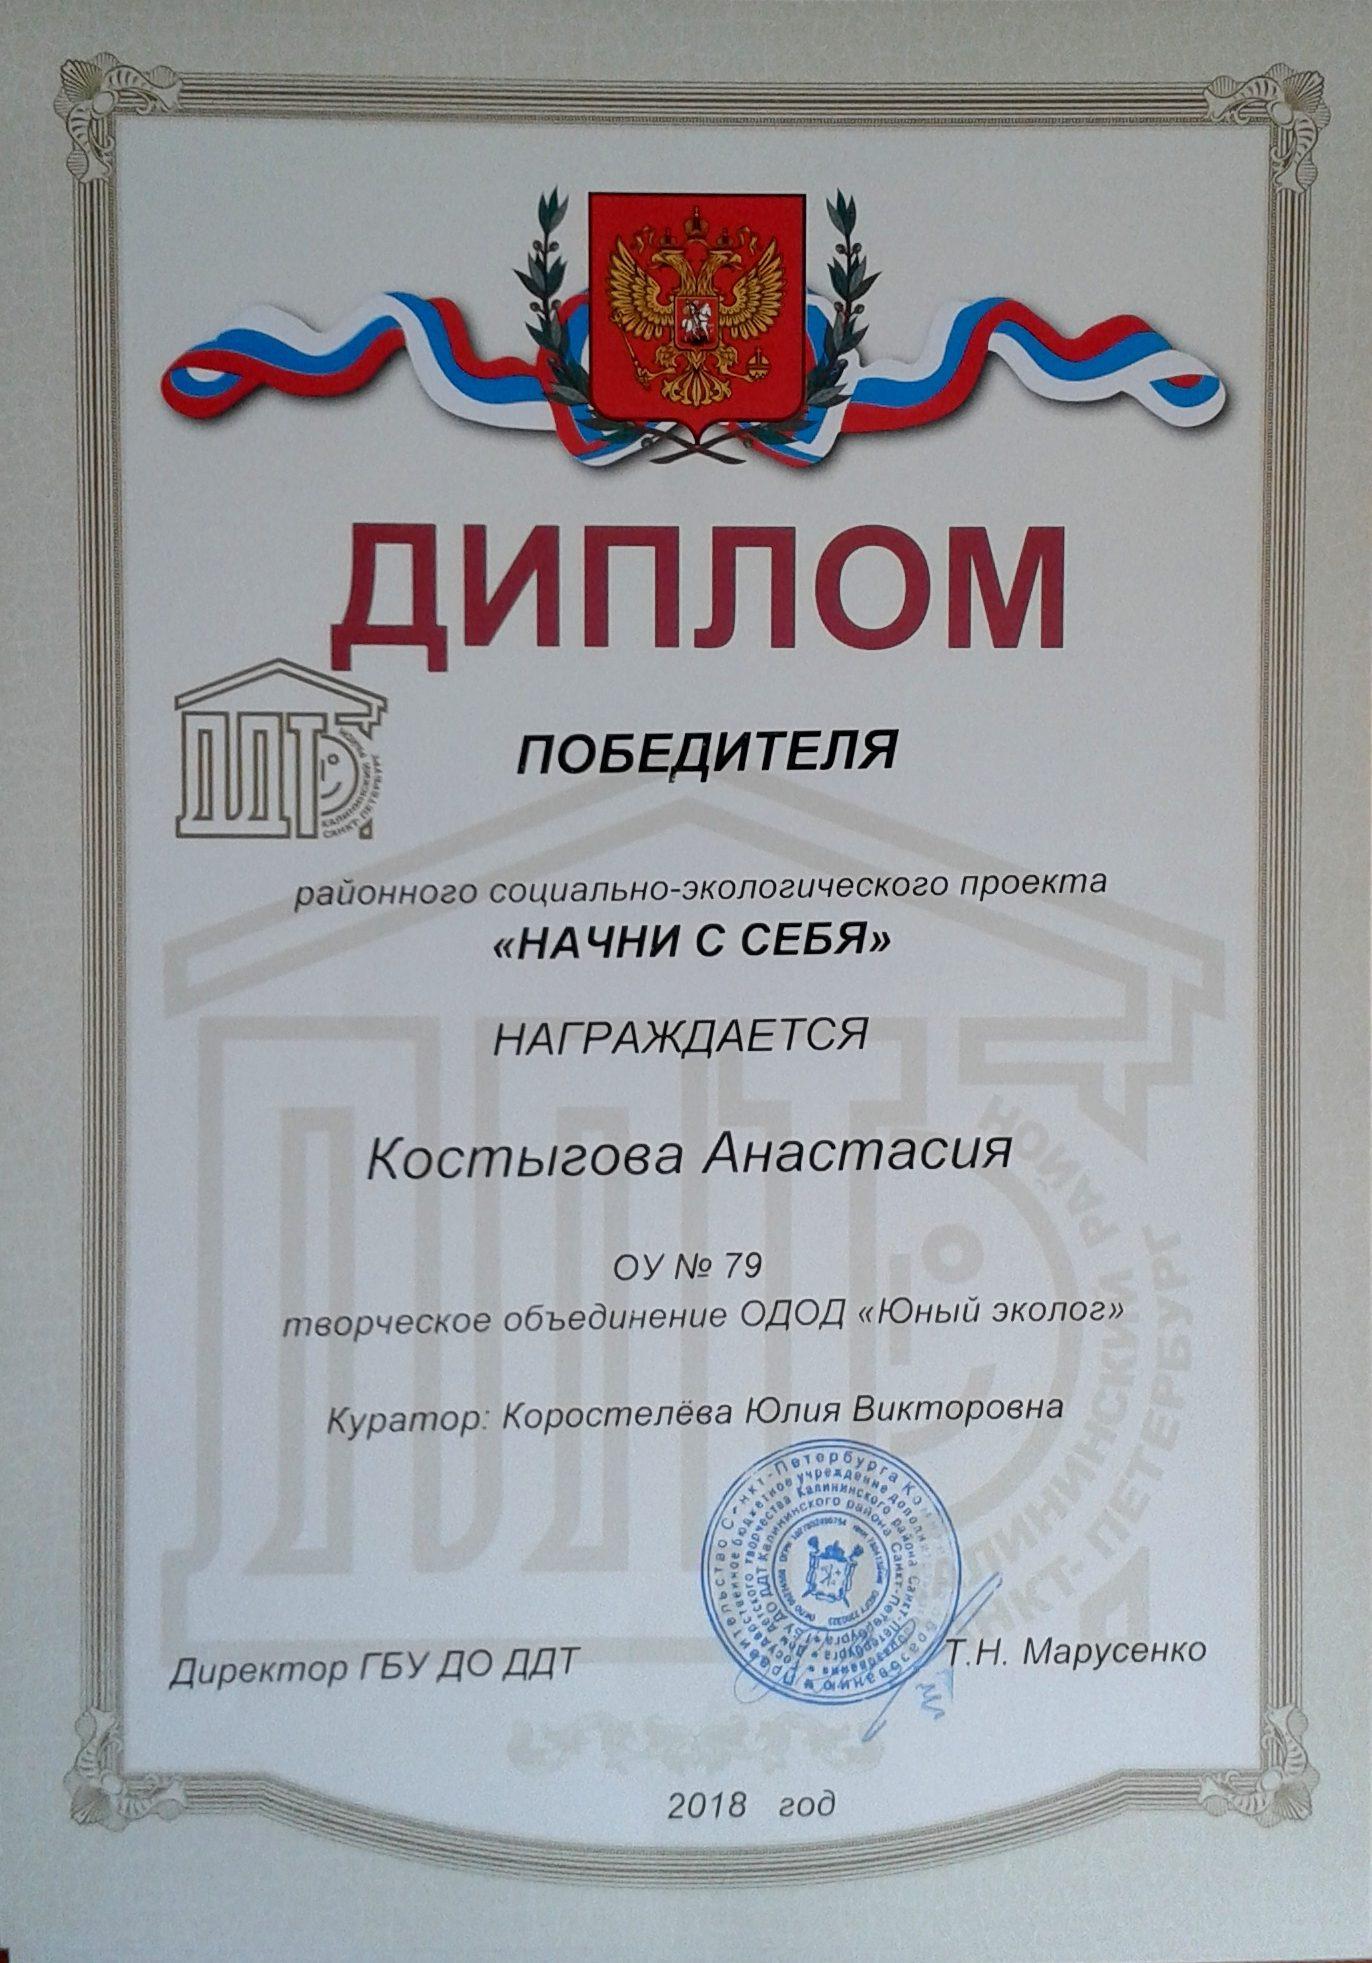 Костыгова Анастасия